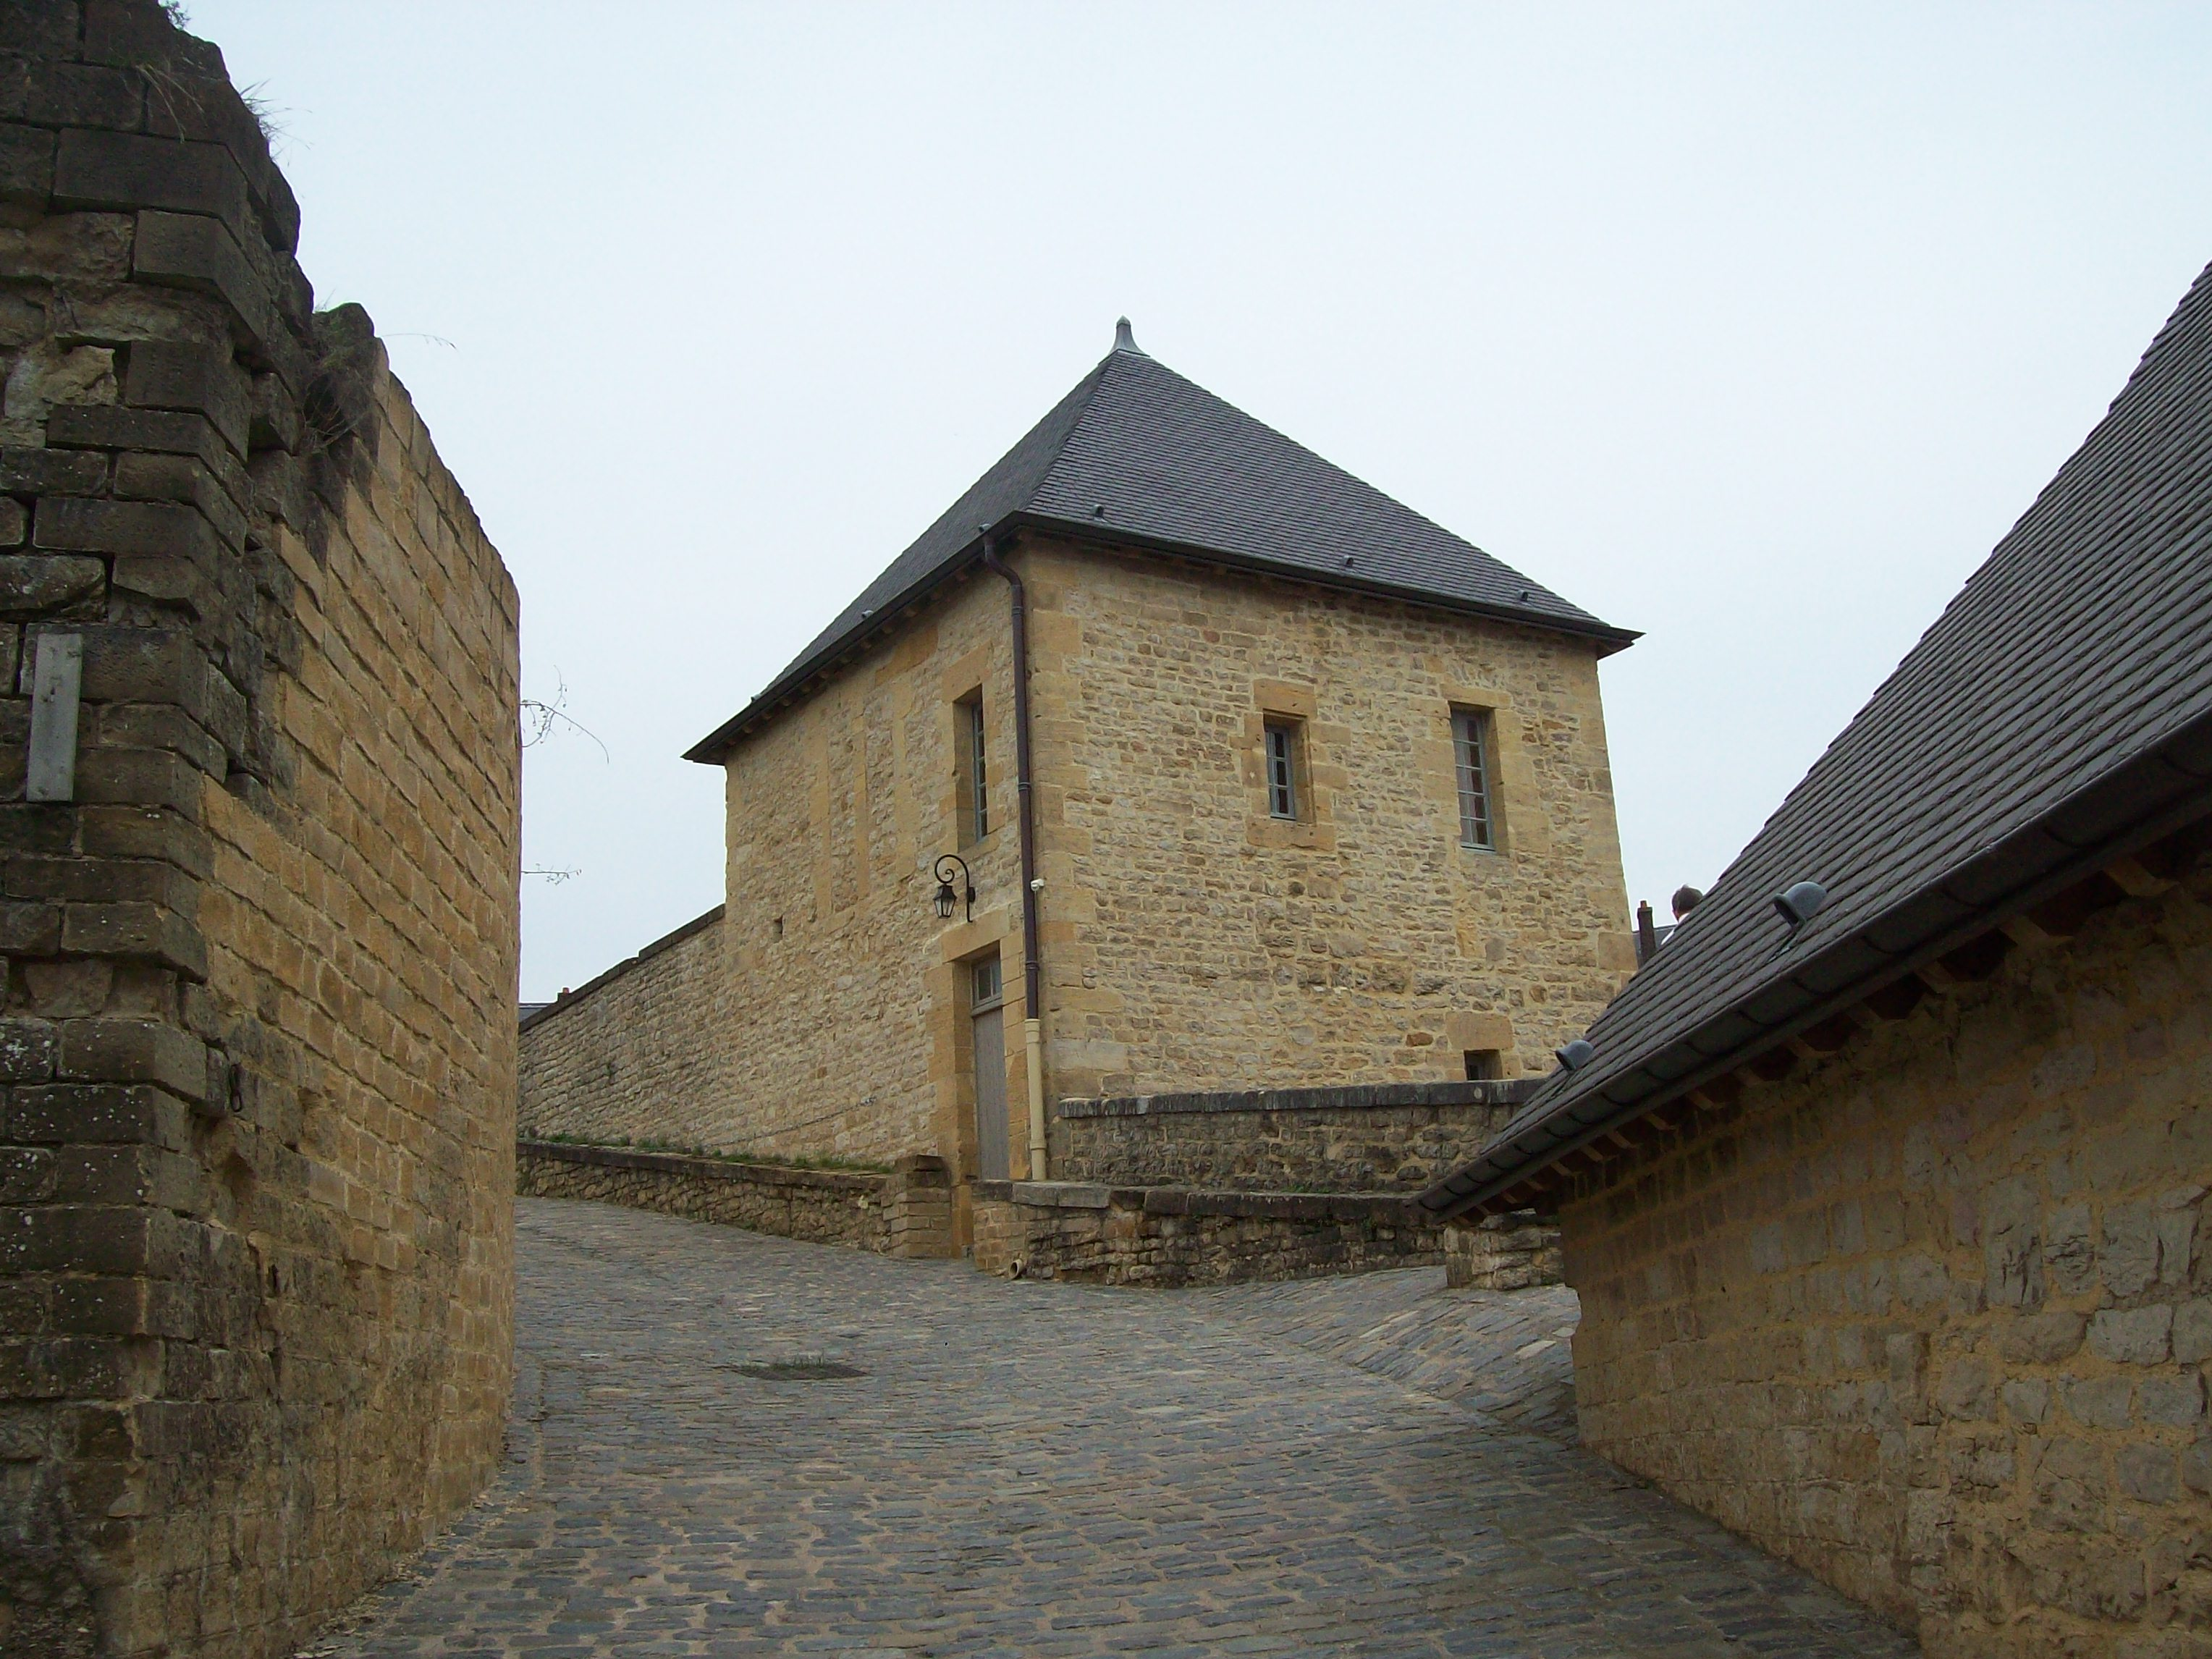 333-chateau_fort_de_sedan.jpg